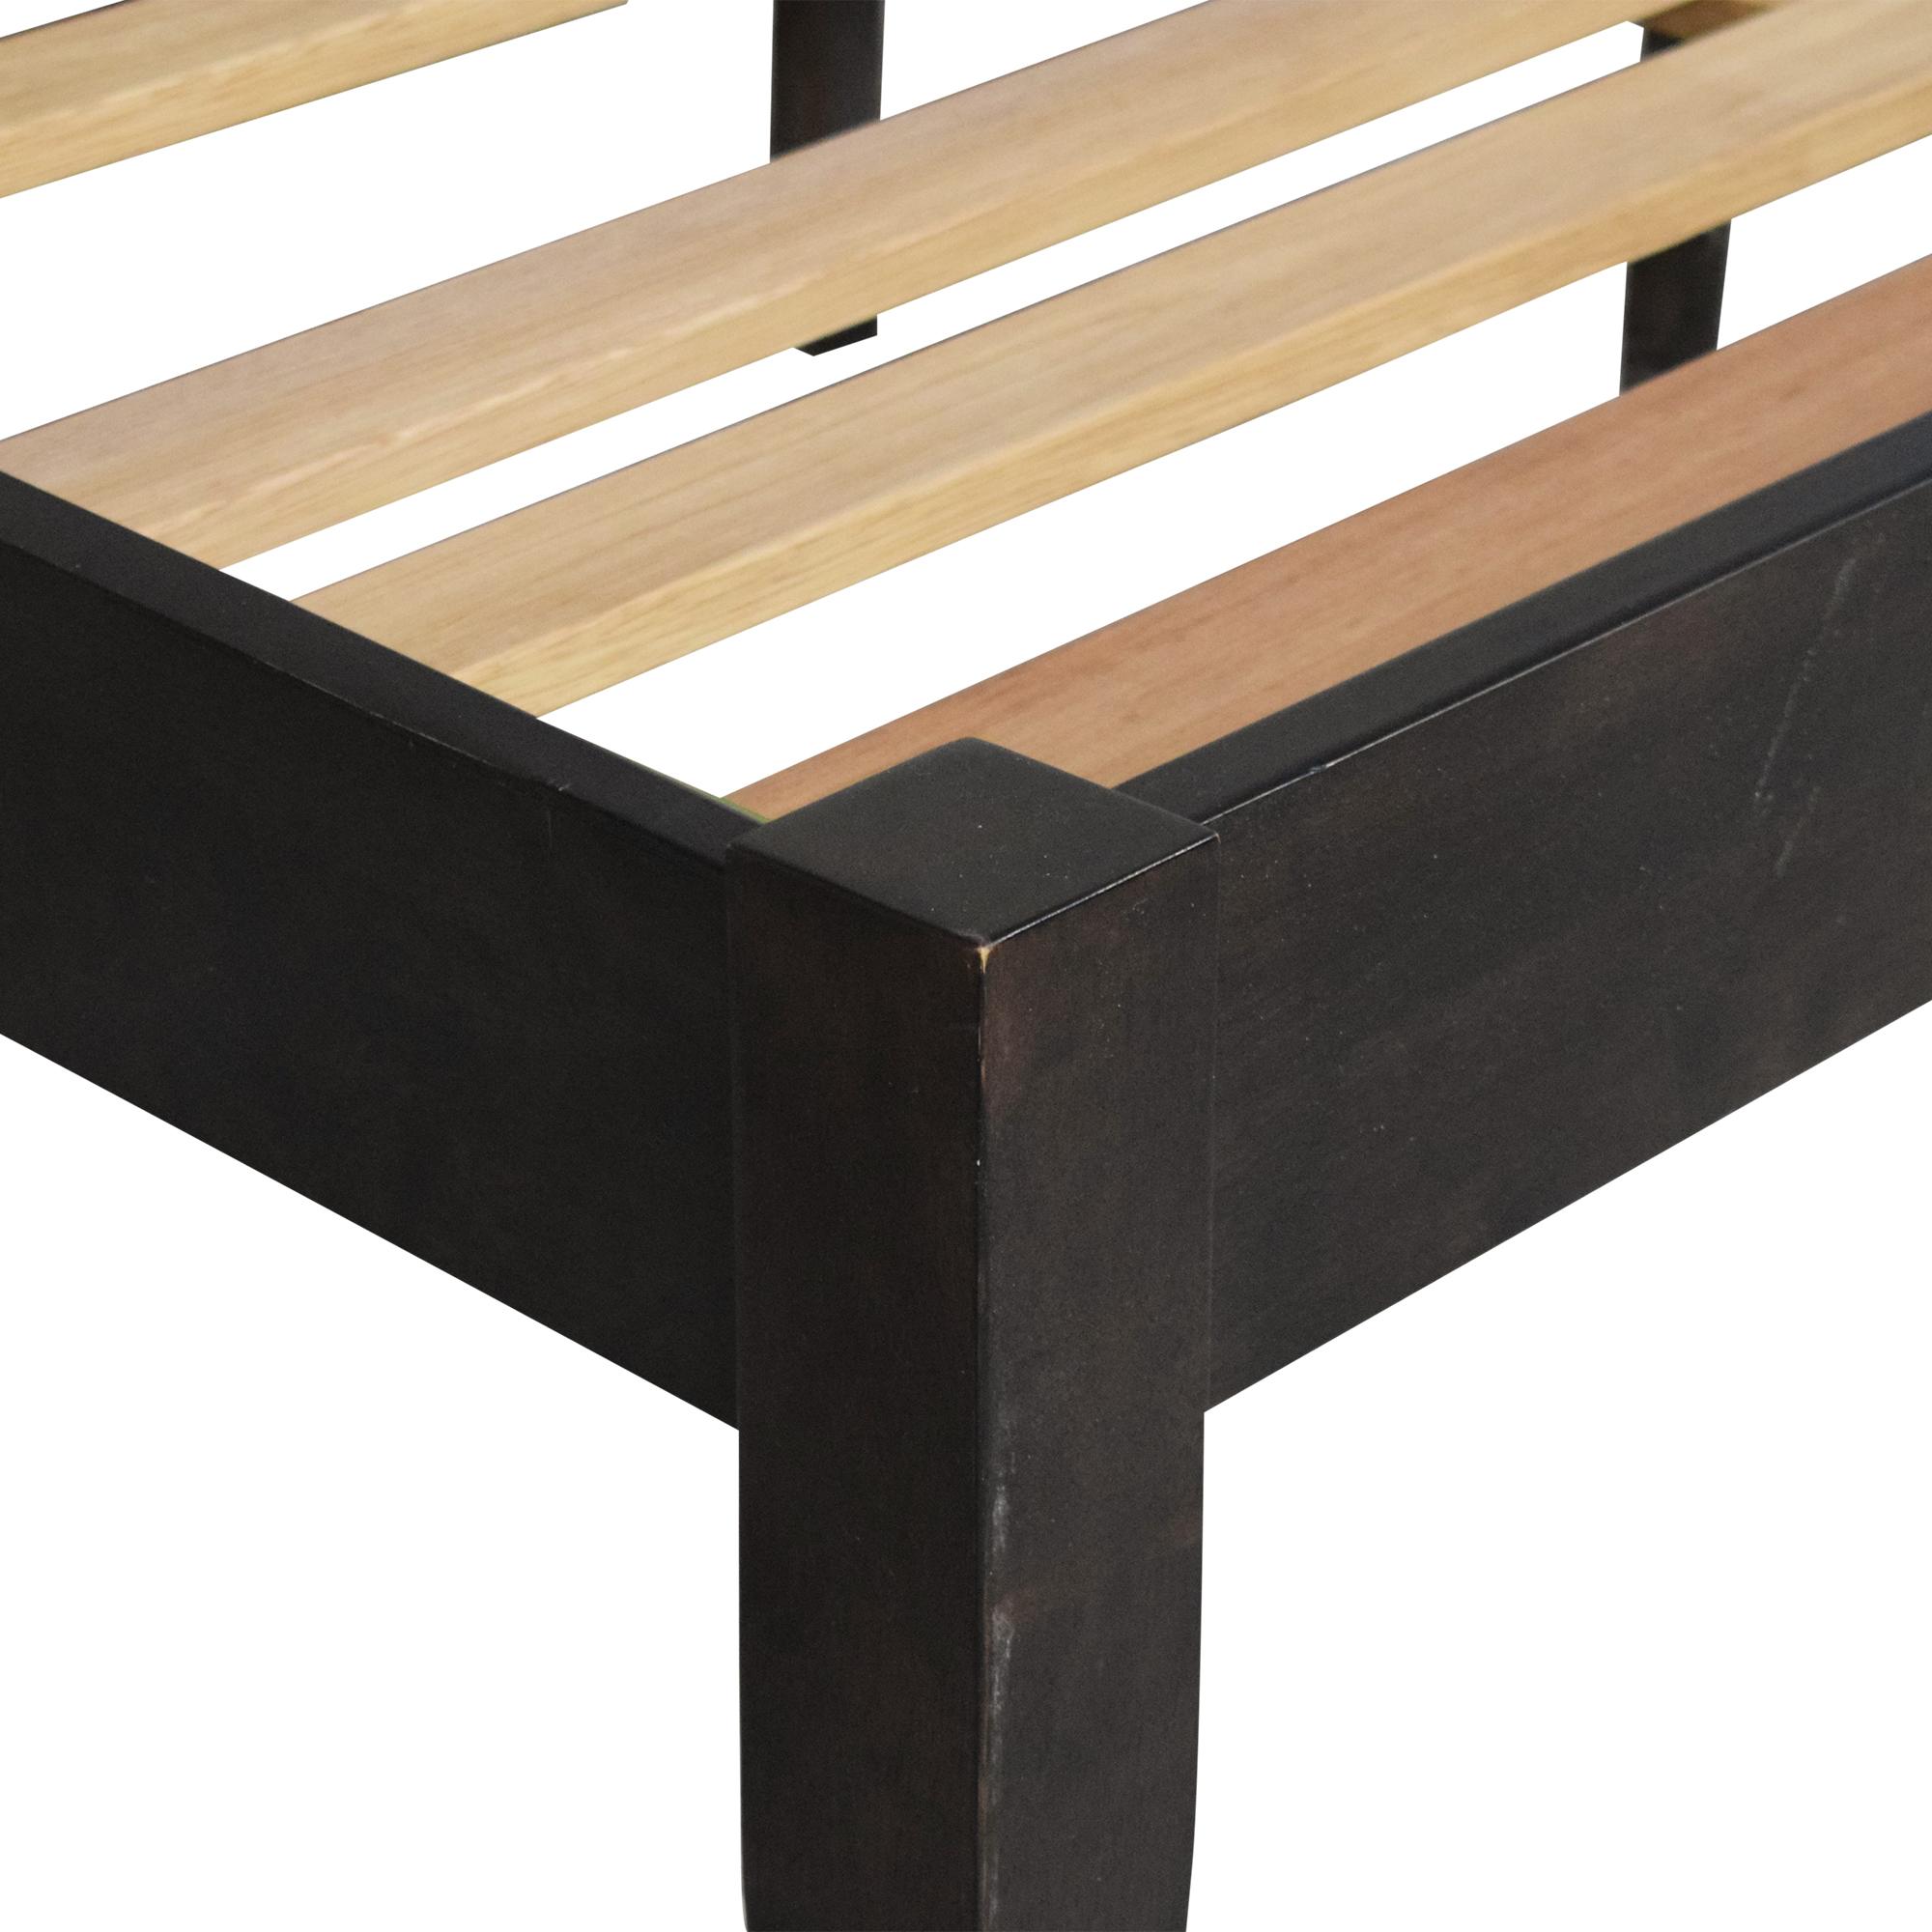 Queen Sleigh Bed / Bed Frames